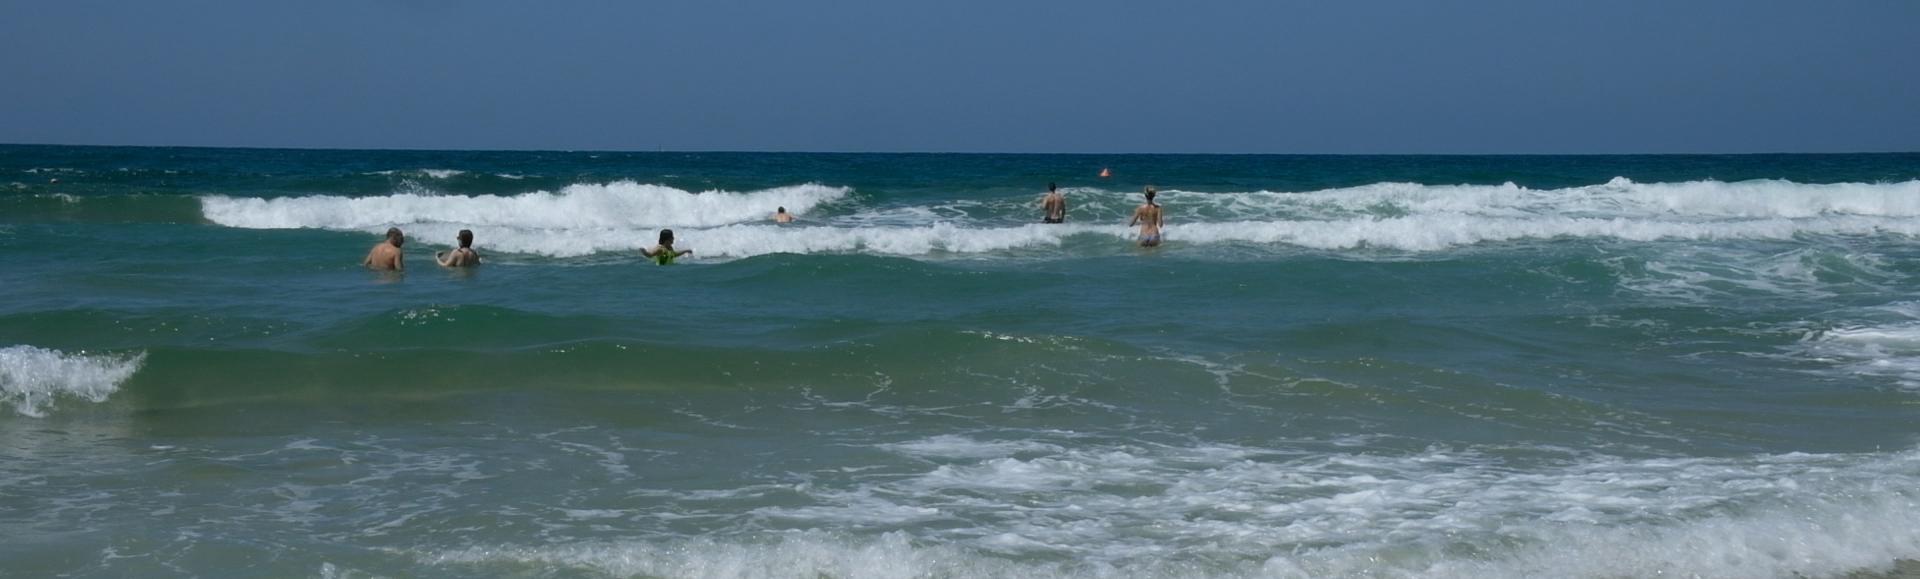 YIDDISH-mer Tel Aviv-cad 1